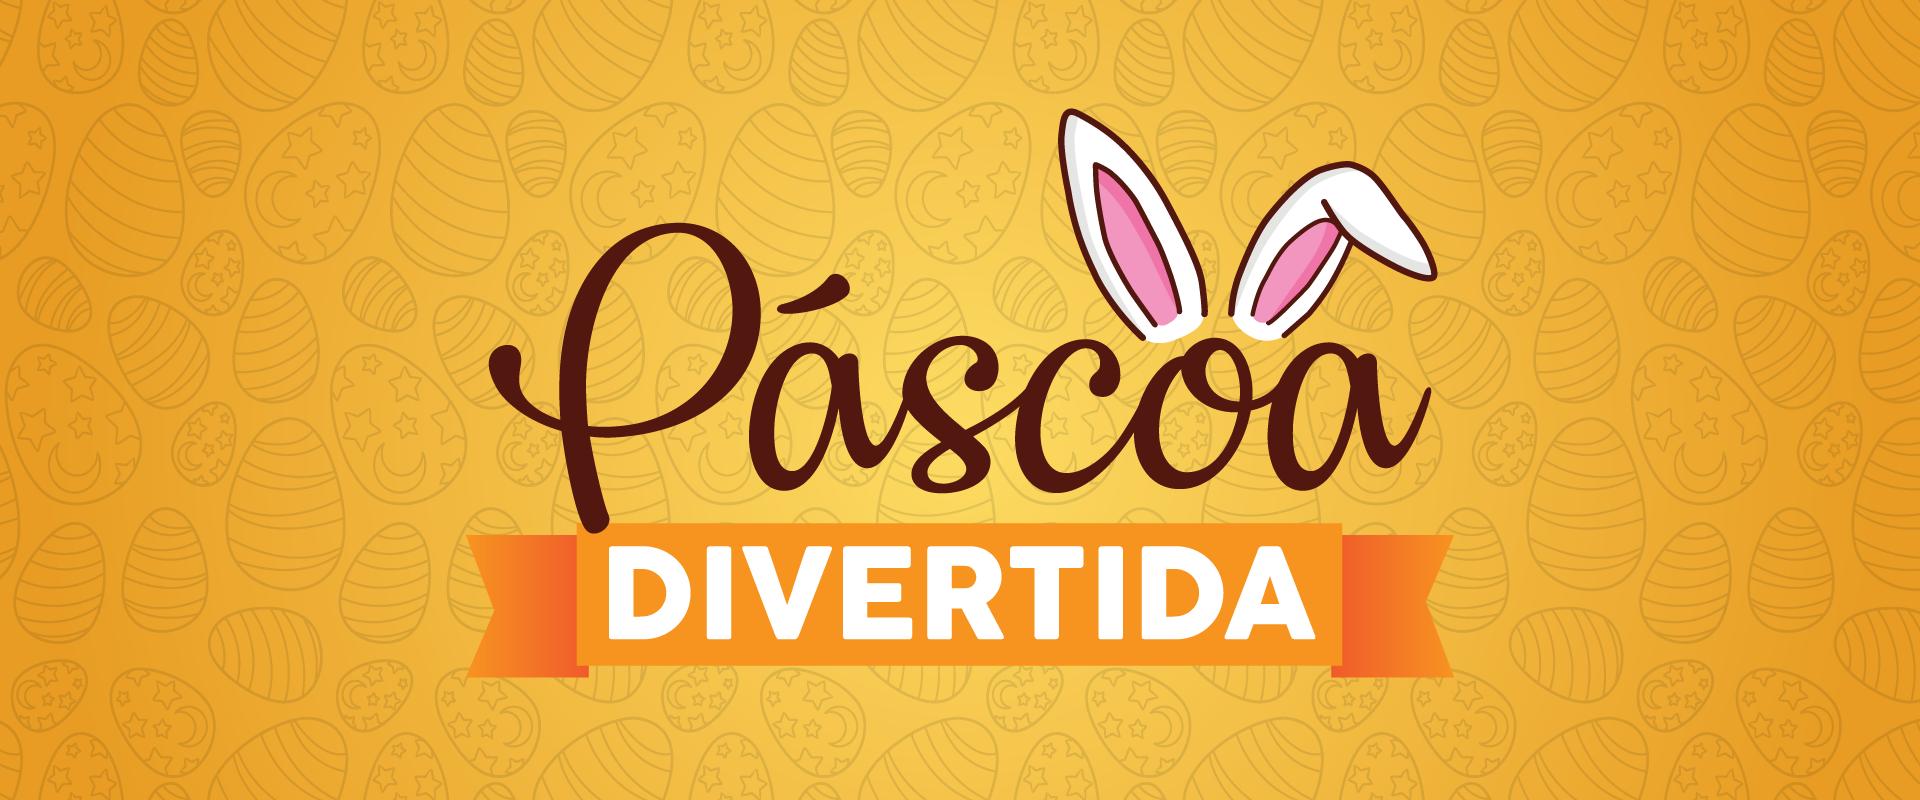 site_Páscoa Divertida_Site_banner